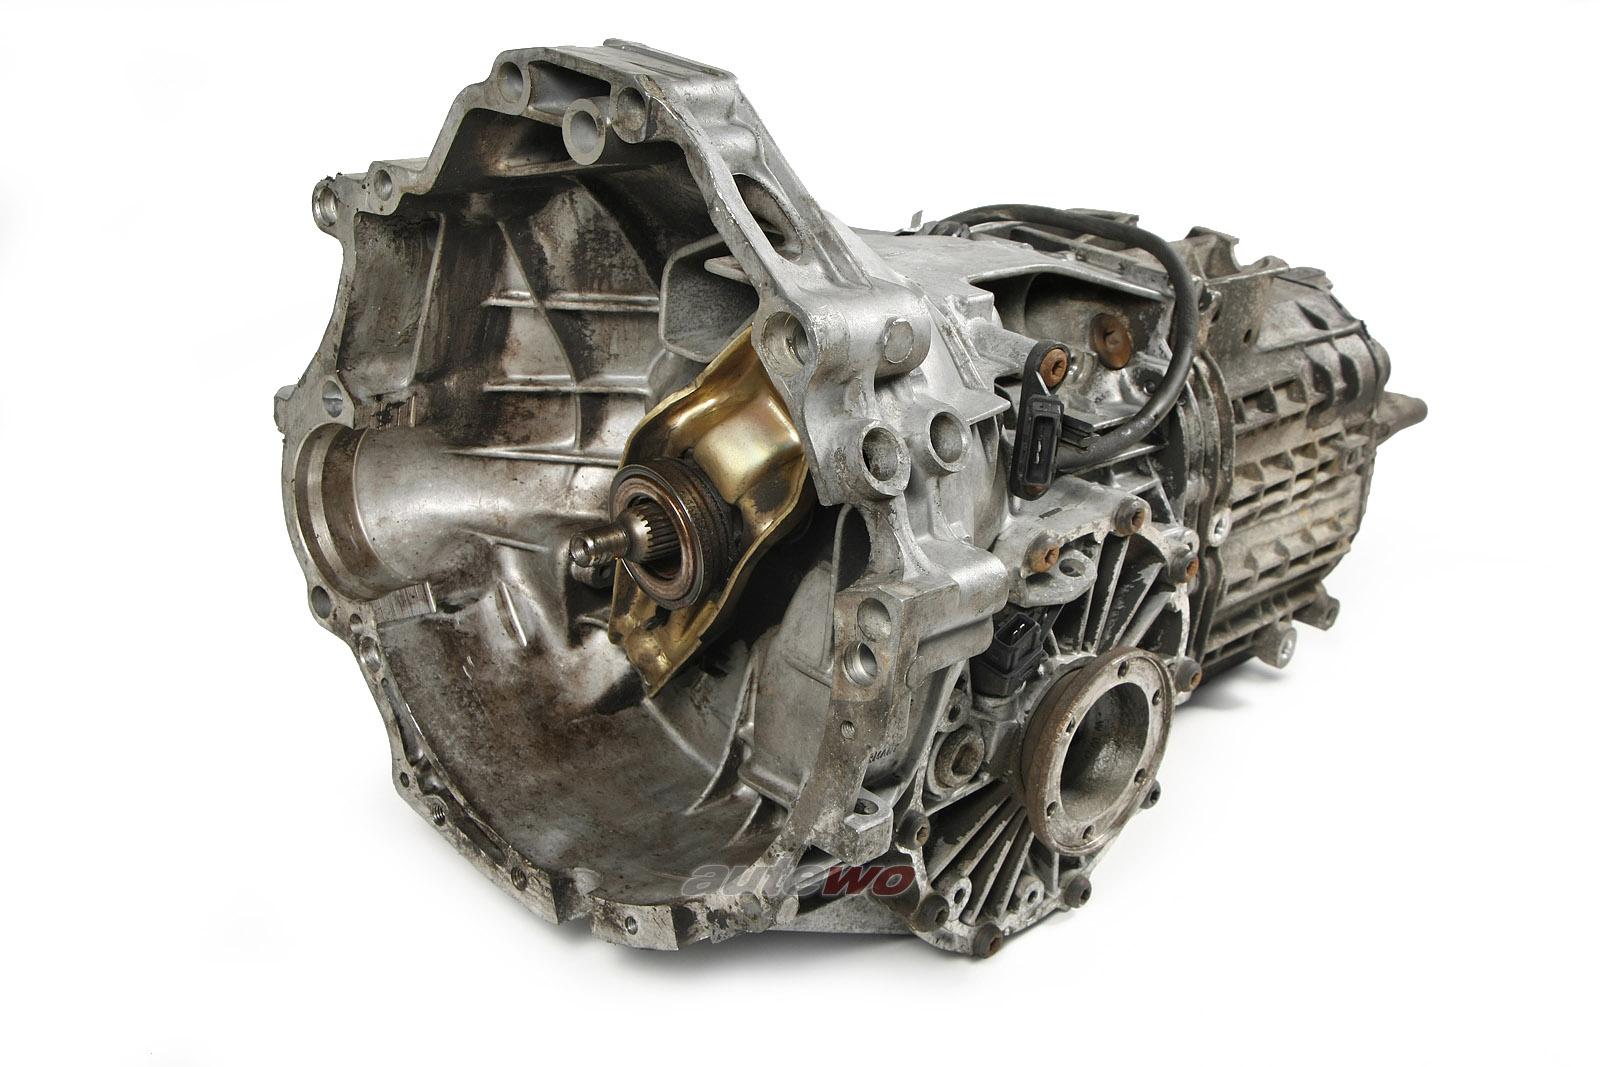 012300046RX Audi 80 Typ 89 1.6l Getriebe 5-Gang CAA 26100